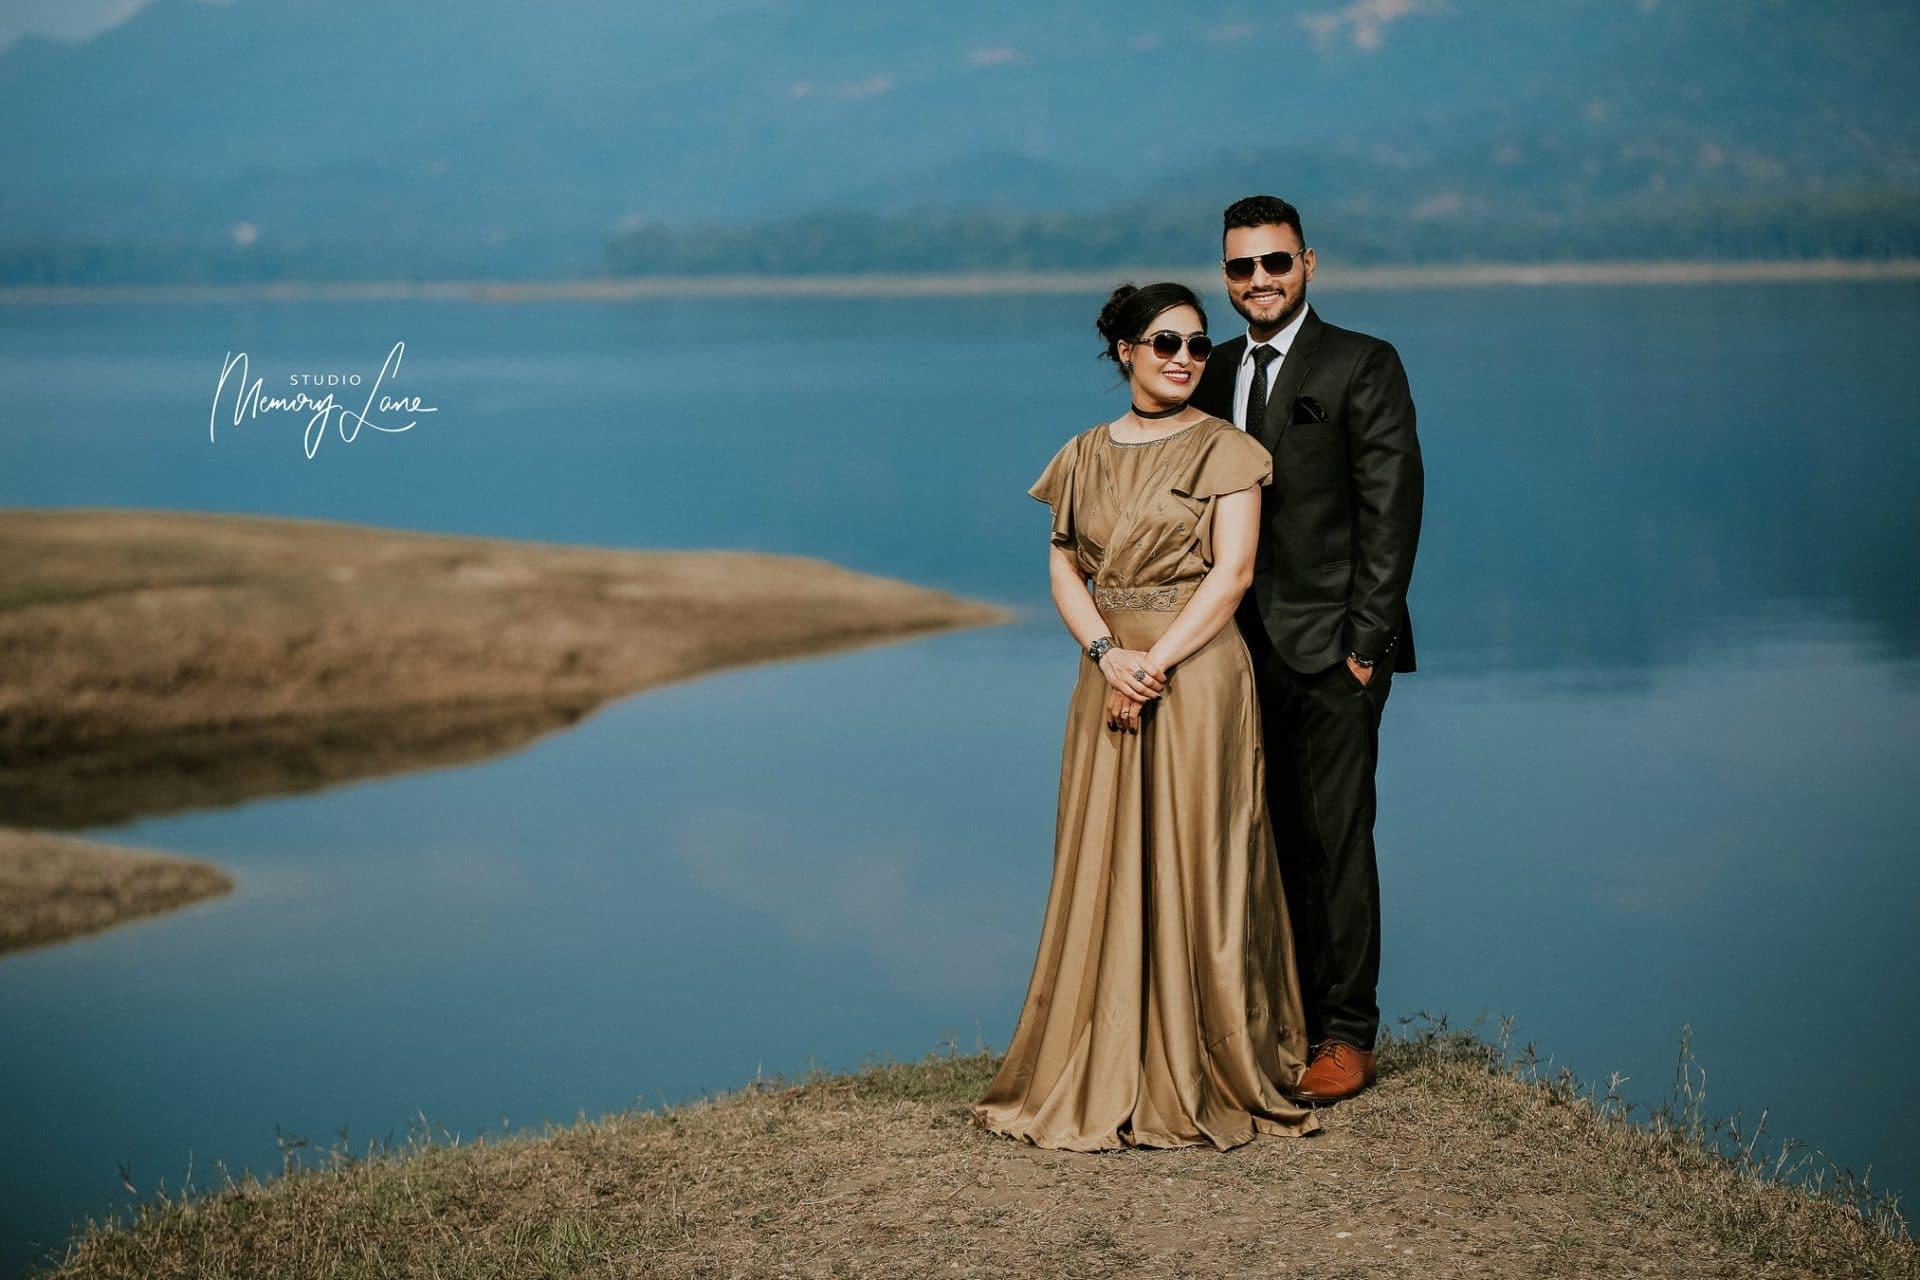 Destination wedding photographer Chandigarh | Loving the site!